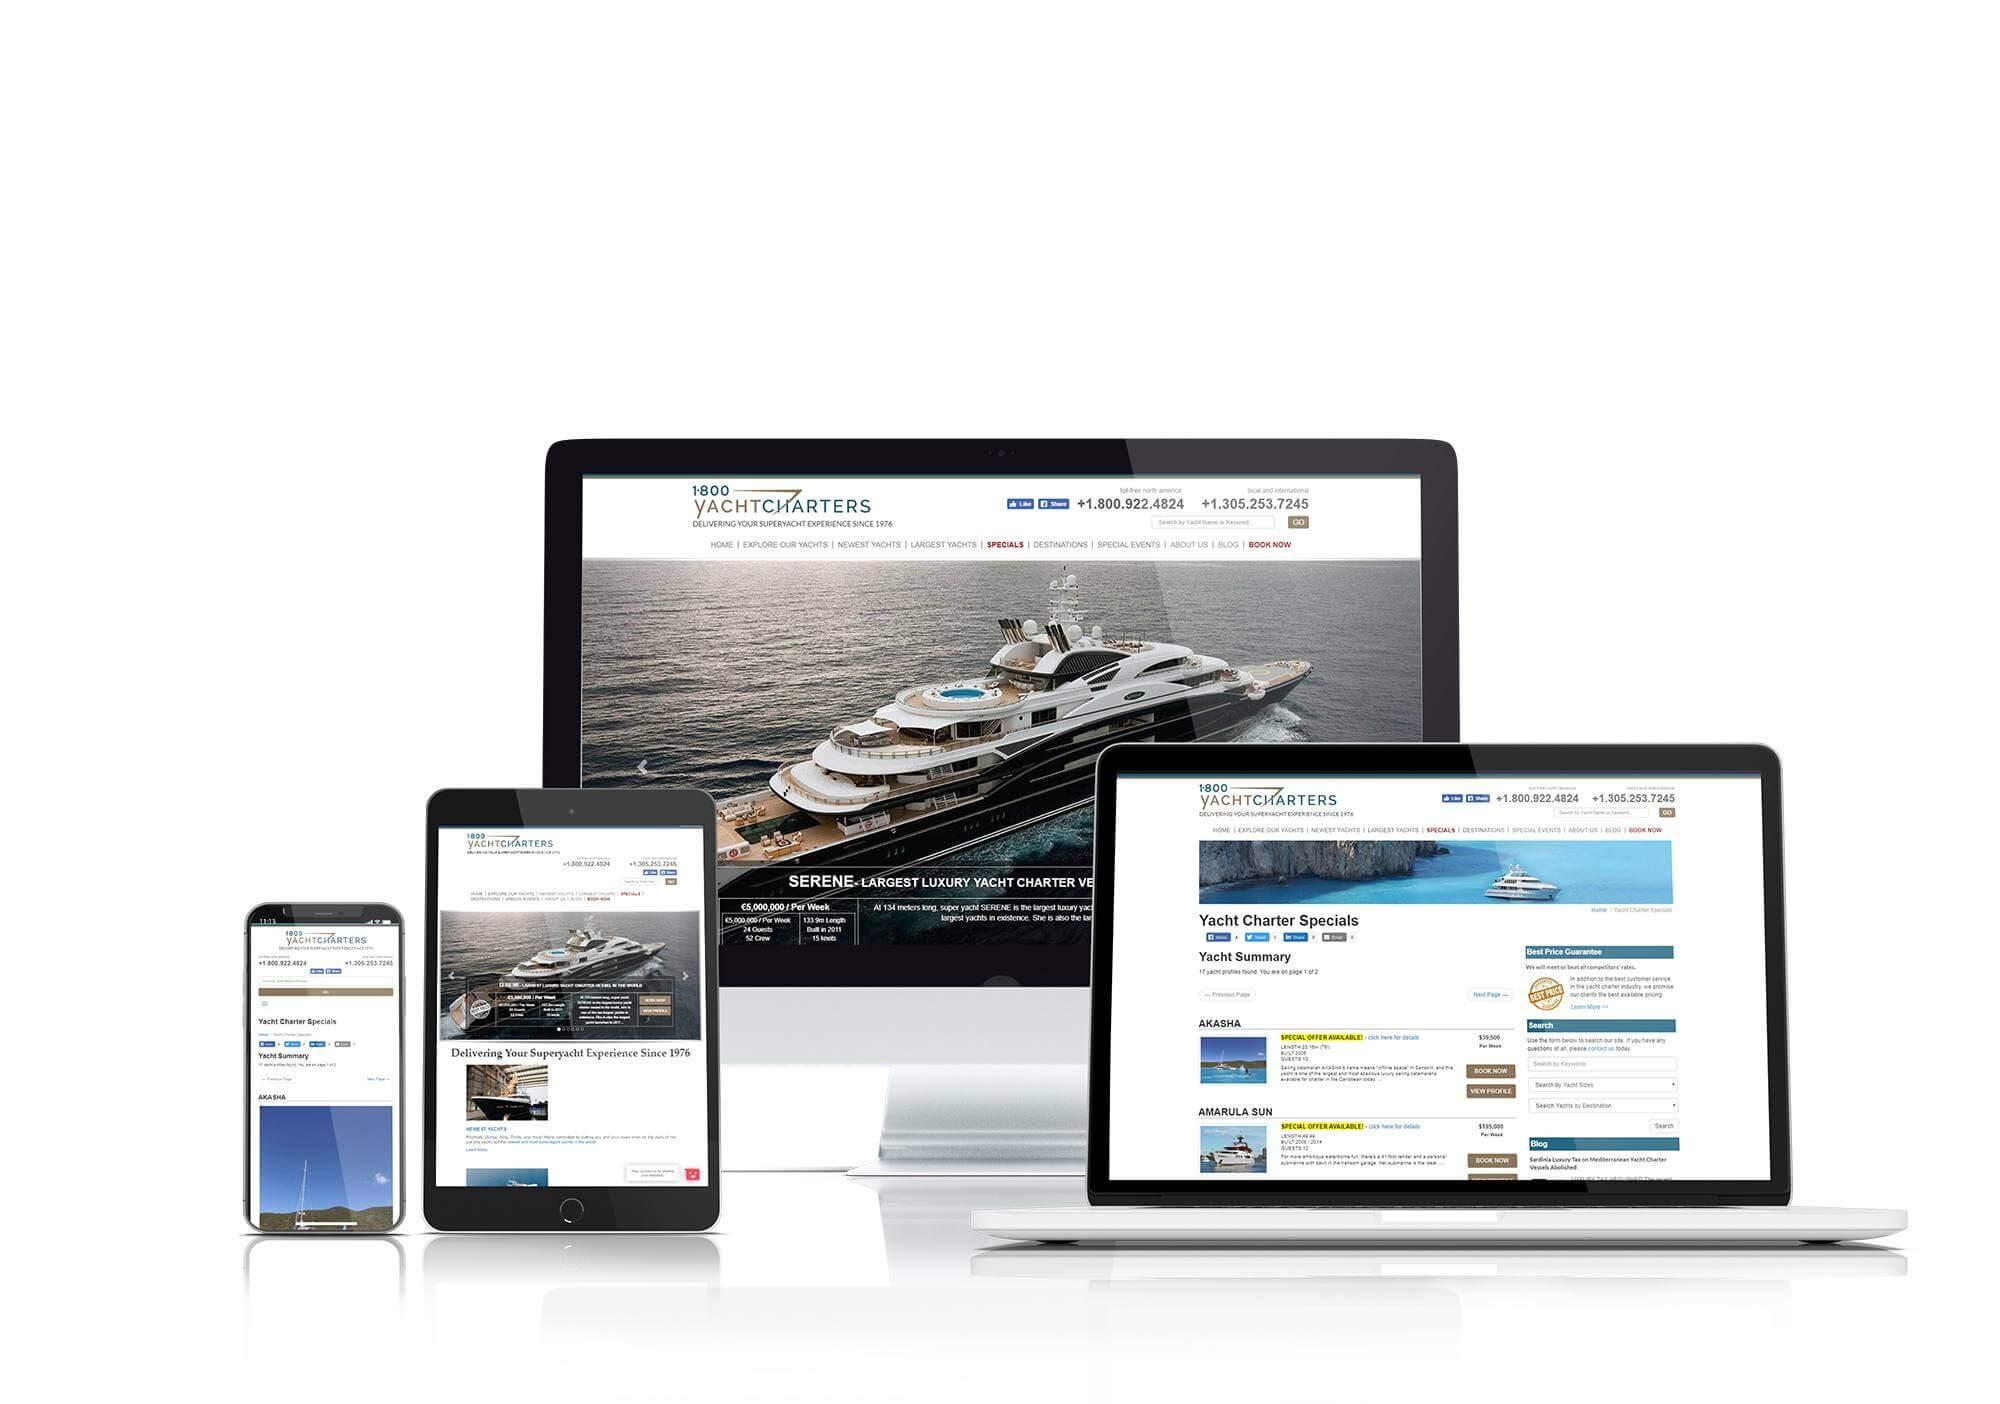 1800 Yacht Charters website